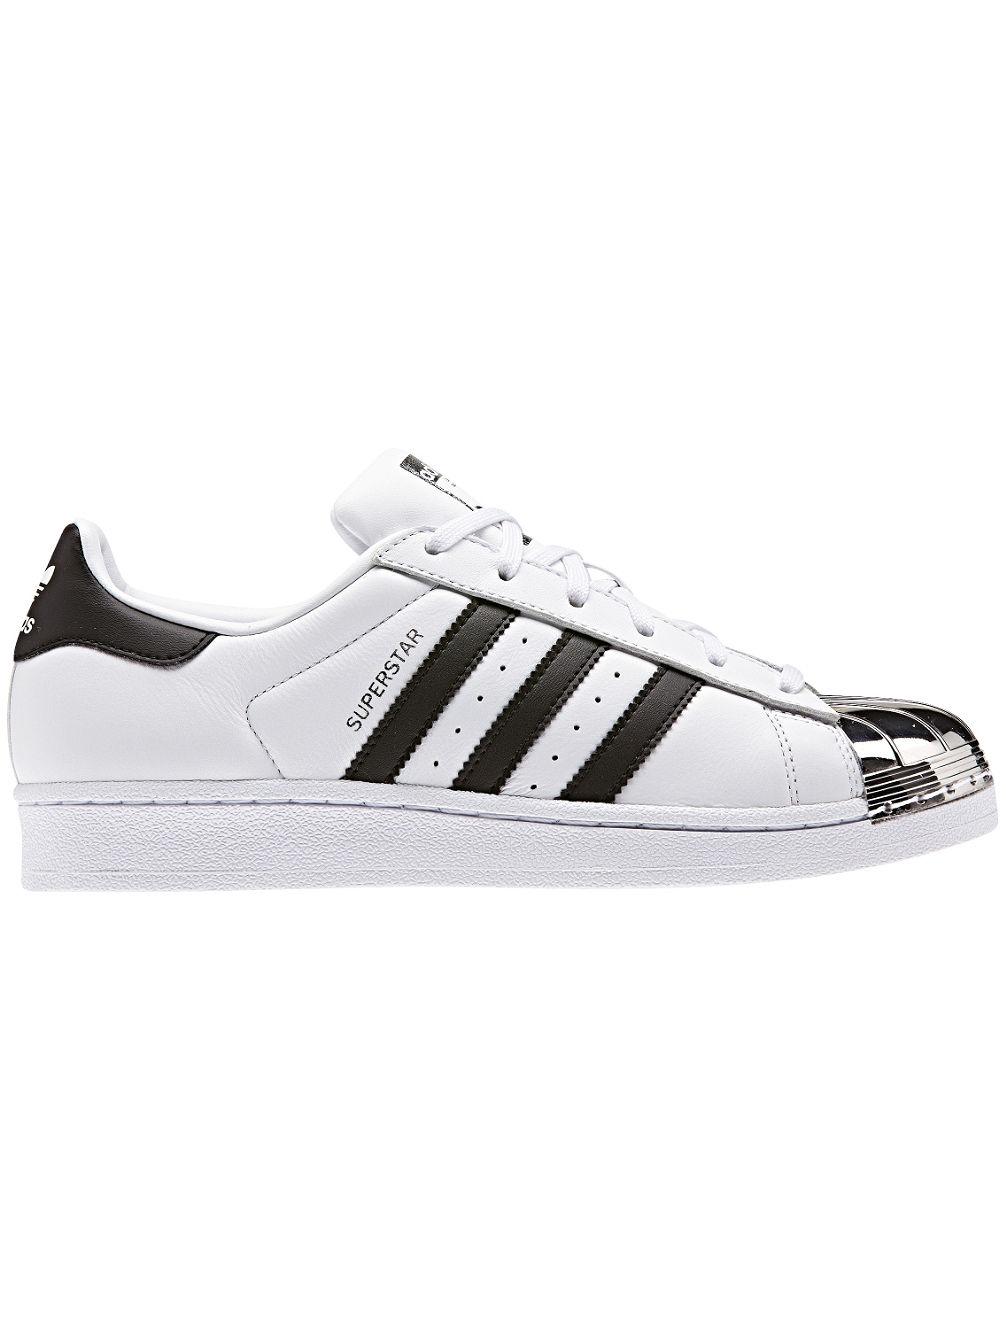 sports shoes 6c99d 04f85 compra adidas originals superstar metal toe w sneakers women online na. BLUE ‑TOMATO